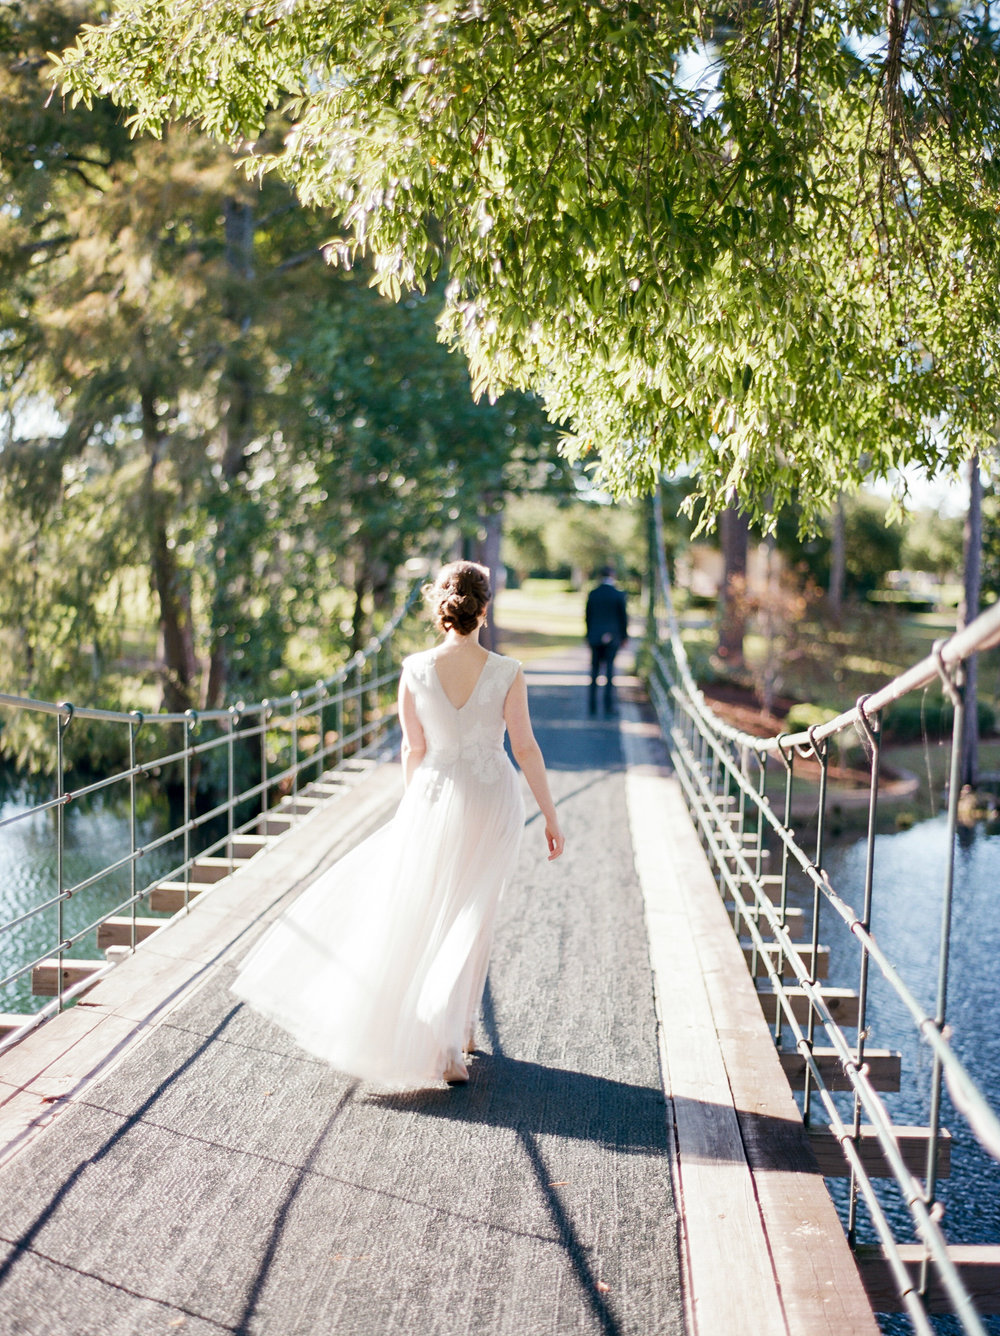 Houston-Wedding-Photographer-Lakeside-Country-Club-First-Look-Bride-Groom-Formals-Film-Fine-Art-Photography-18.jpg